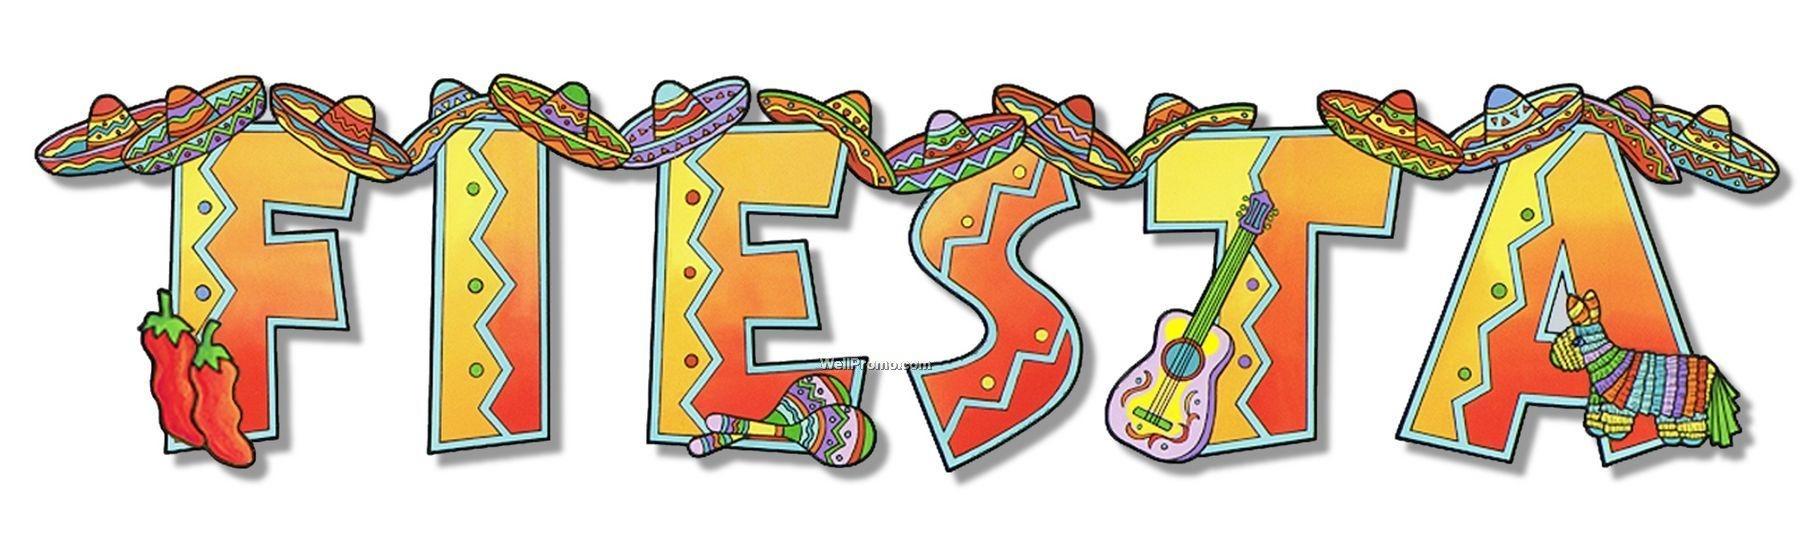 Awesome jokingart com download. Fiesta clipart